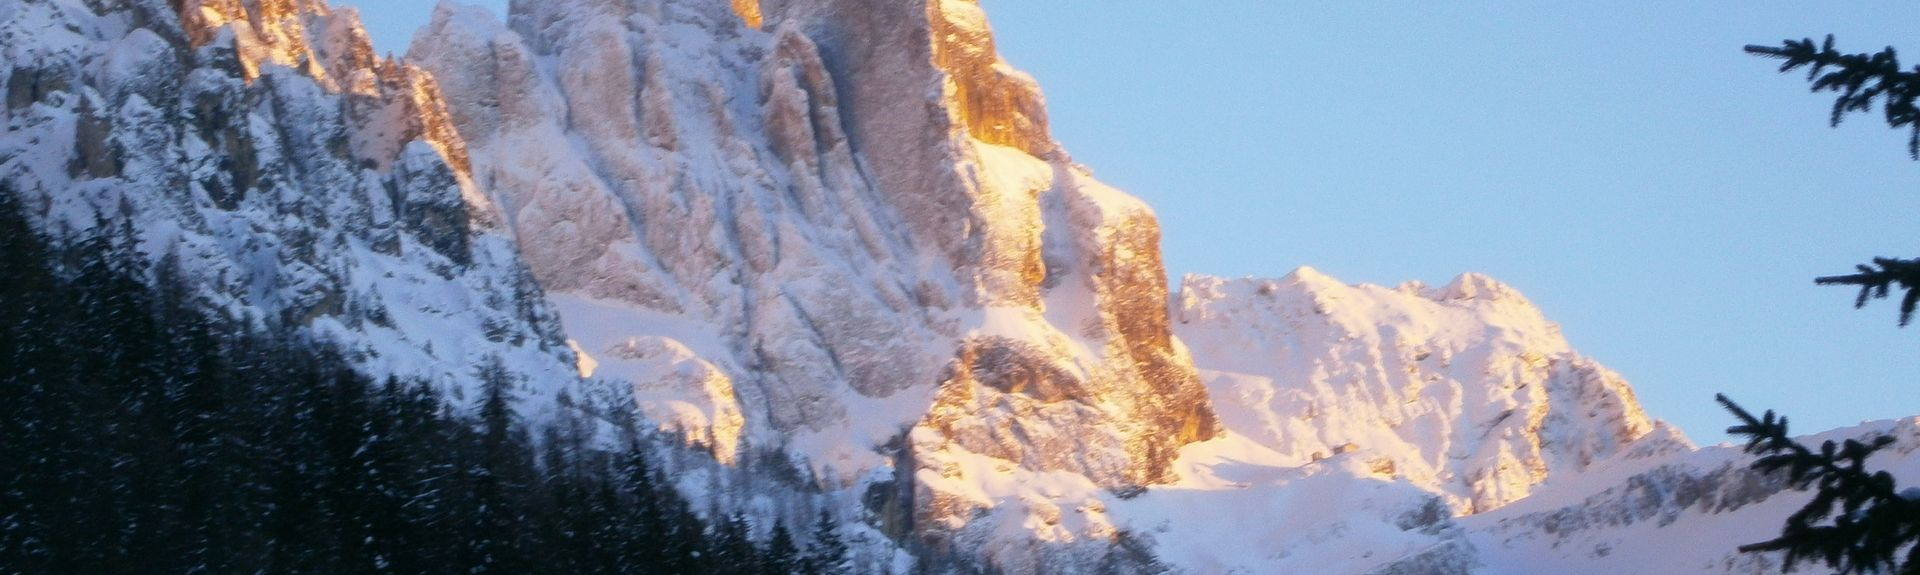 Sagron Mis, Trento, Trentino-Alto Adige/South Tyrol, Italy